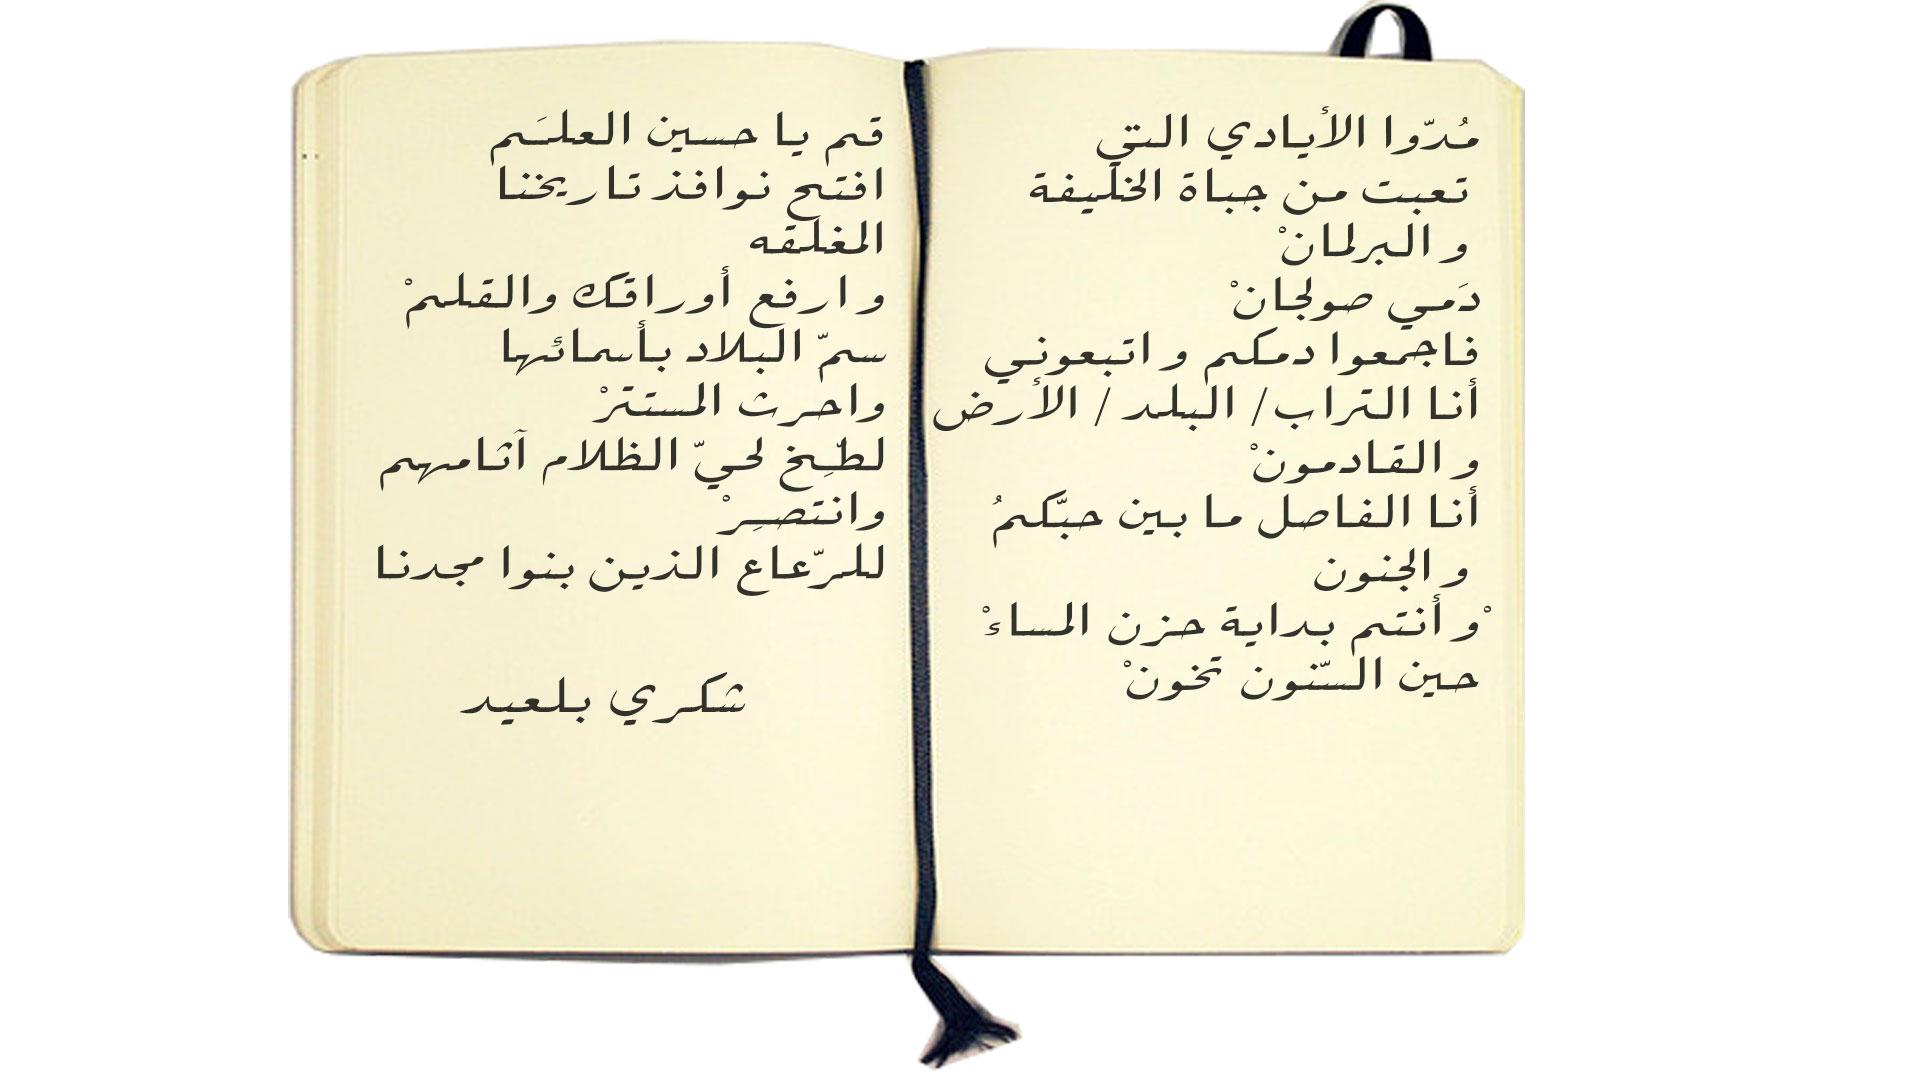 portrait-chokri-belaid-poem-1920-inkyfada